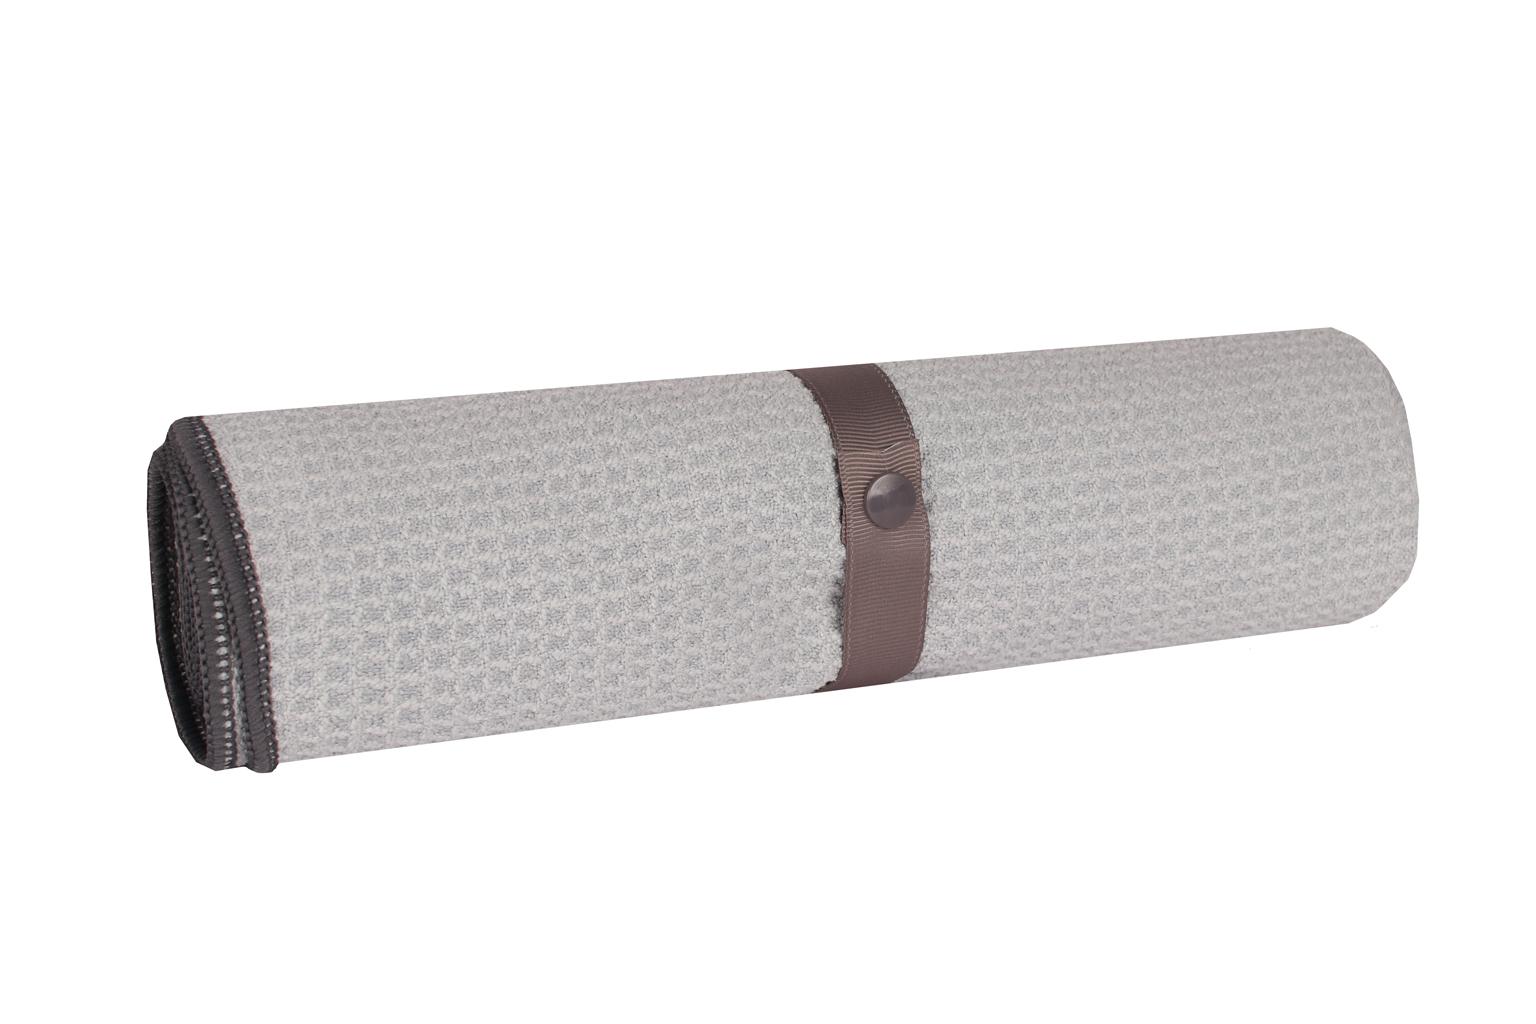 Mikrofaser Pfoten- und Felltuch grau - grau